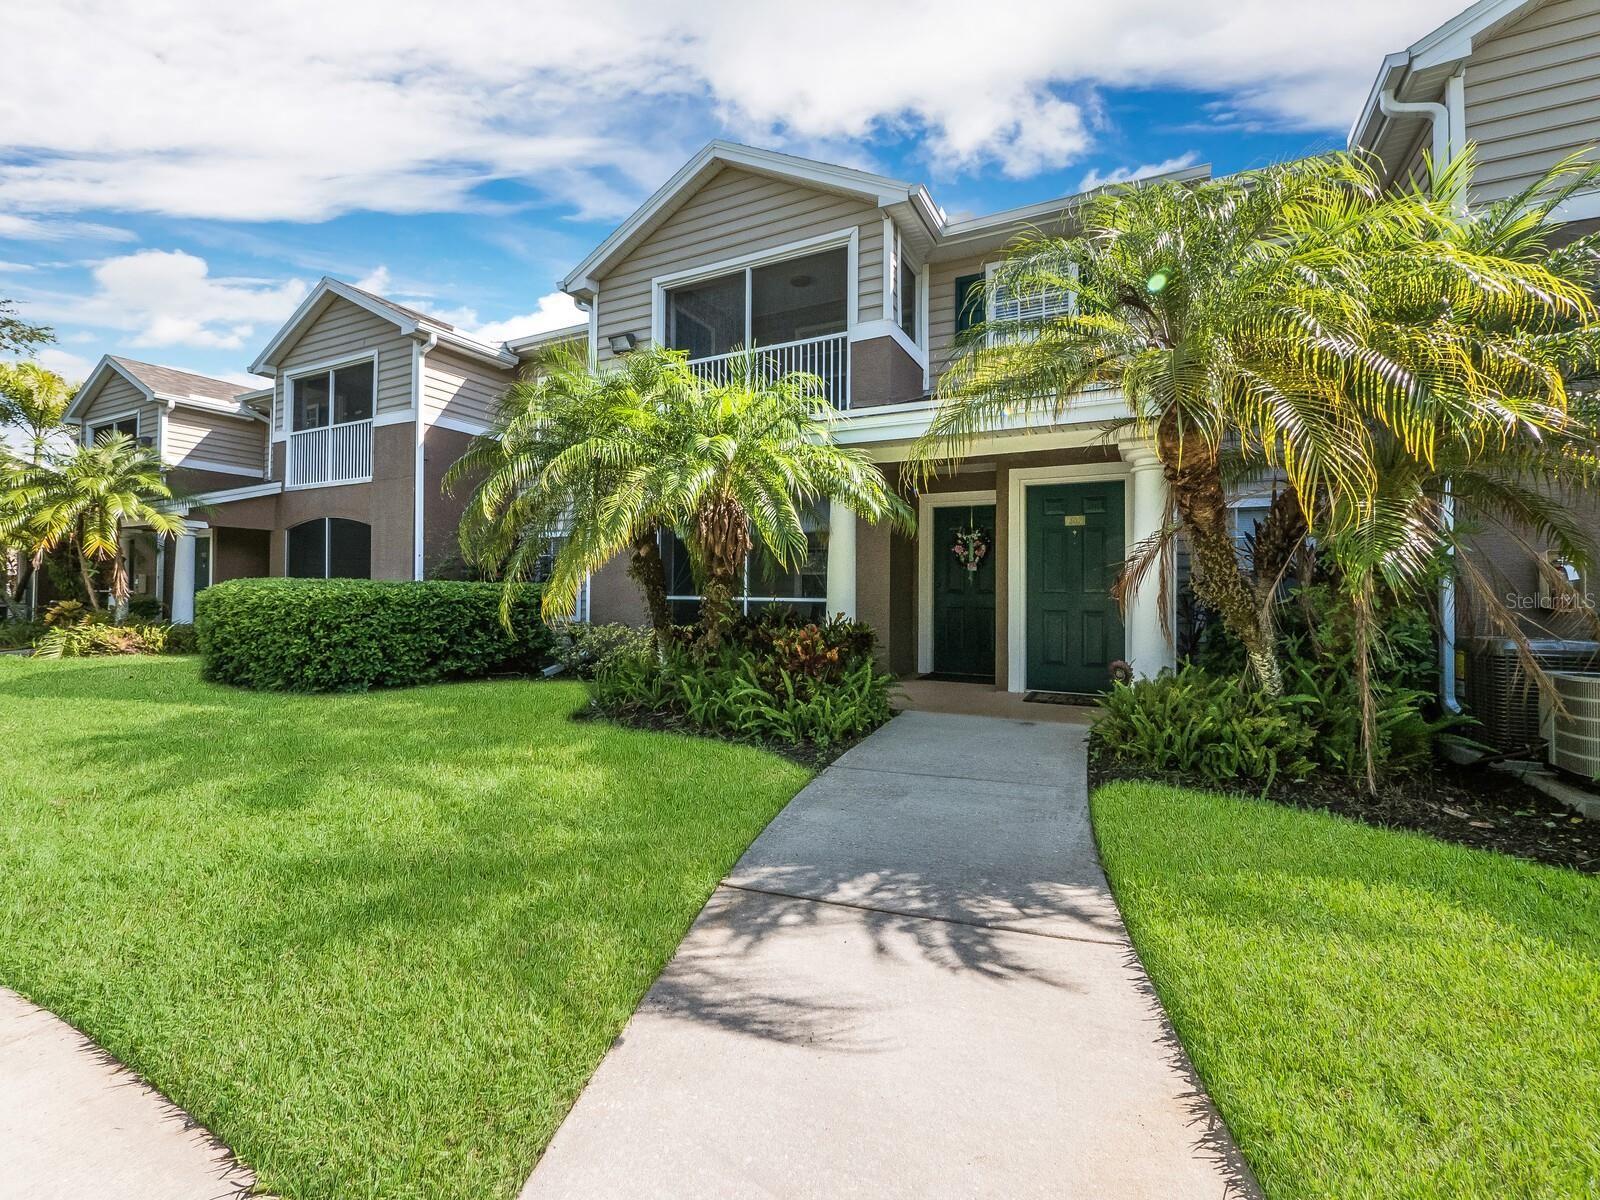 8821 MANOR LOOP #207, Lakewood Ranch, FL 34202 - #: A4511934